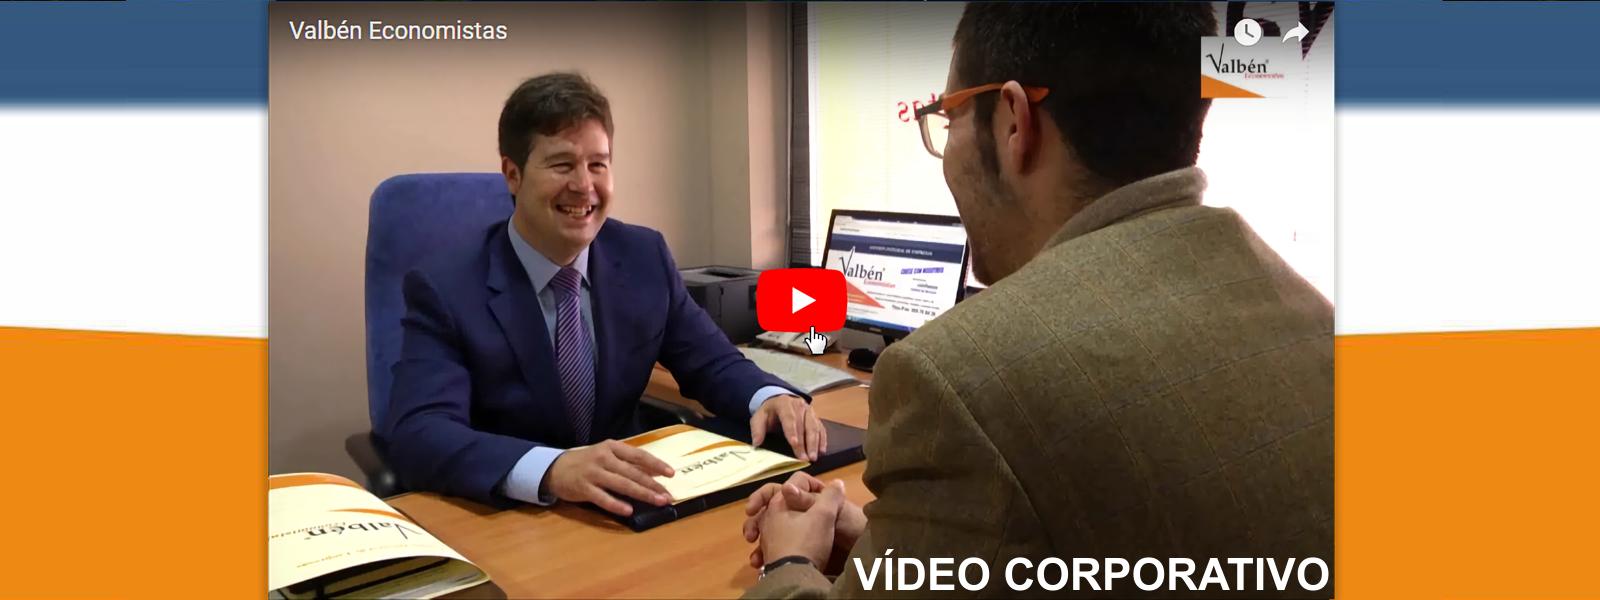 Vídeo Corporativo Valbén Economistas